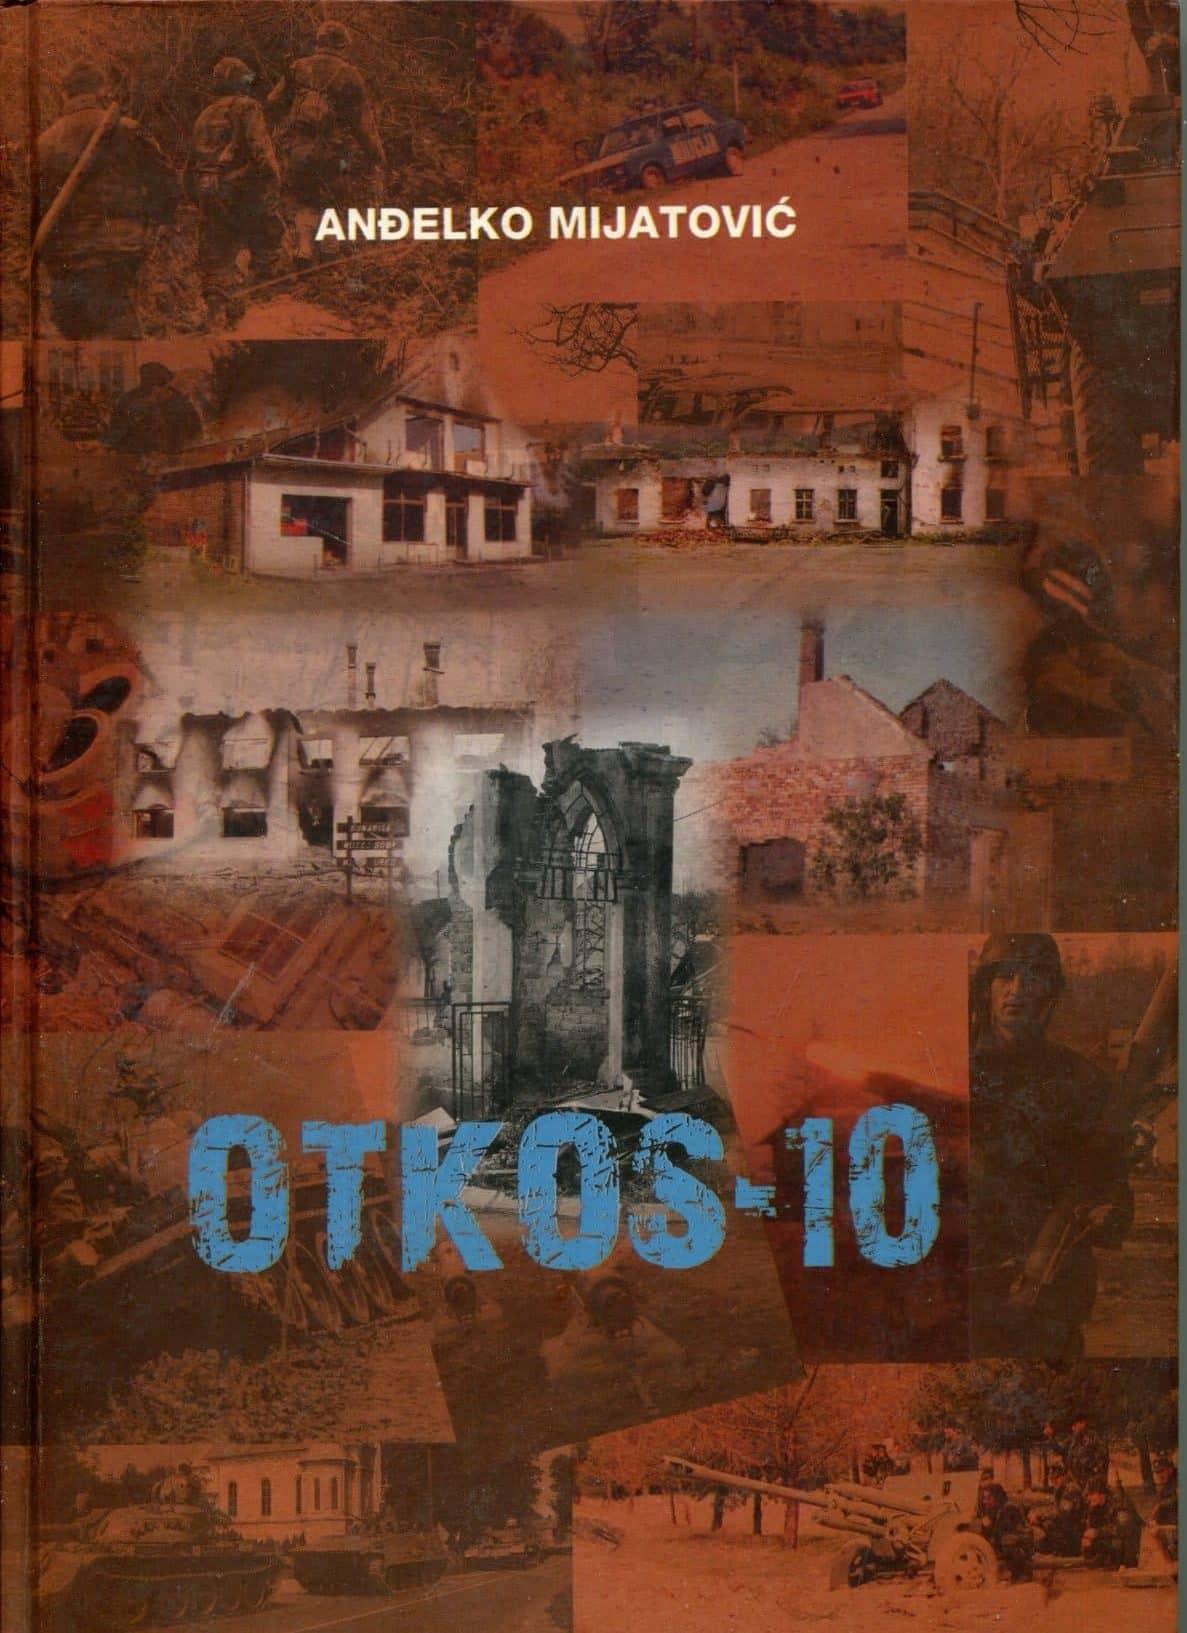 OTKOS-10 Anđelko Mijatović